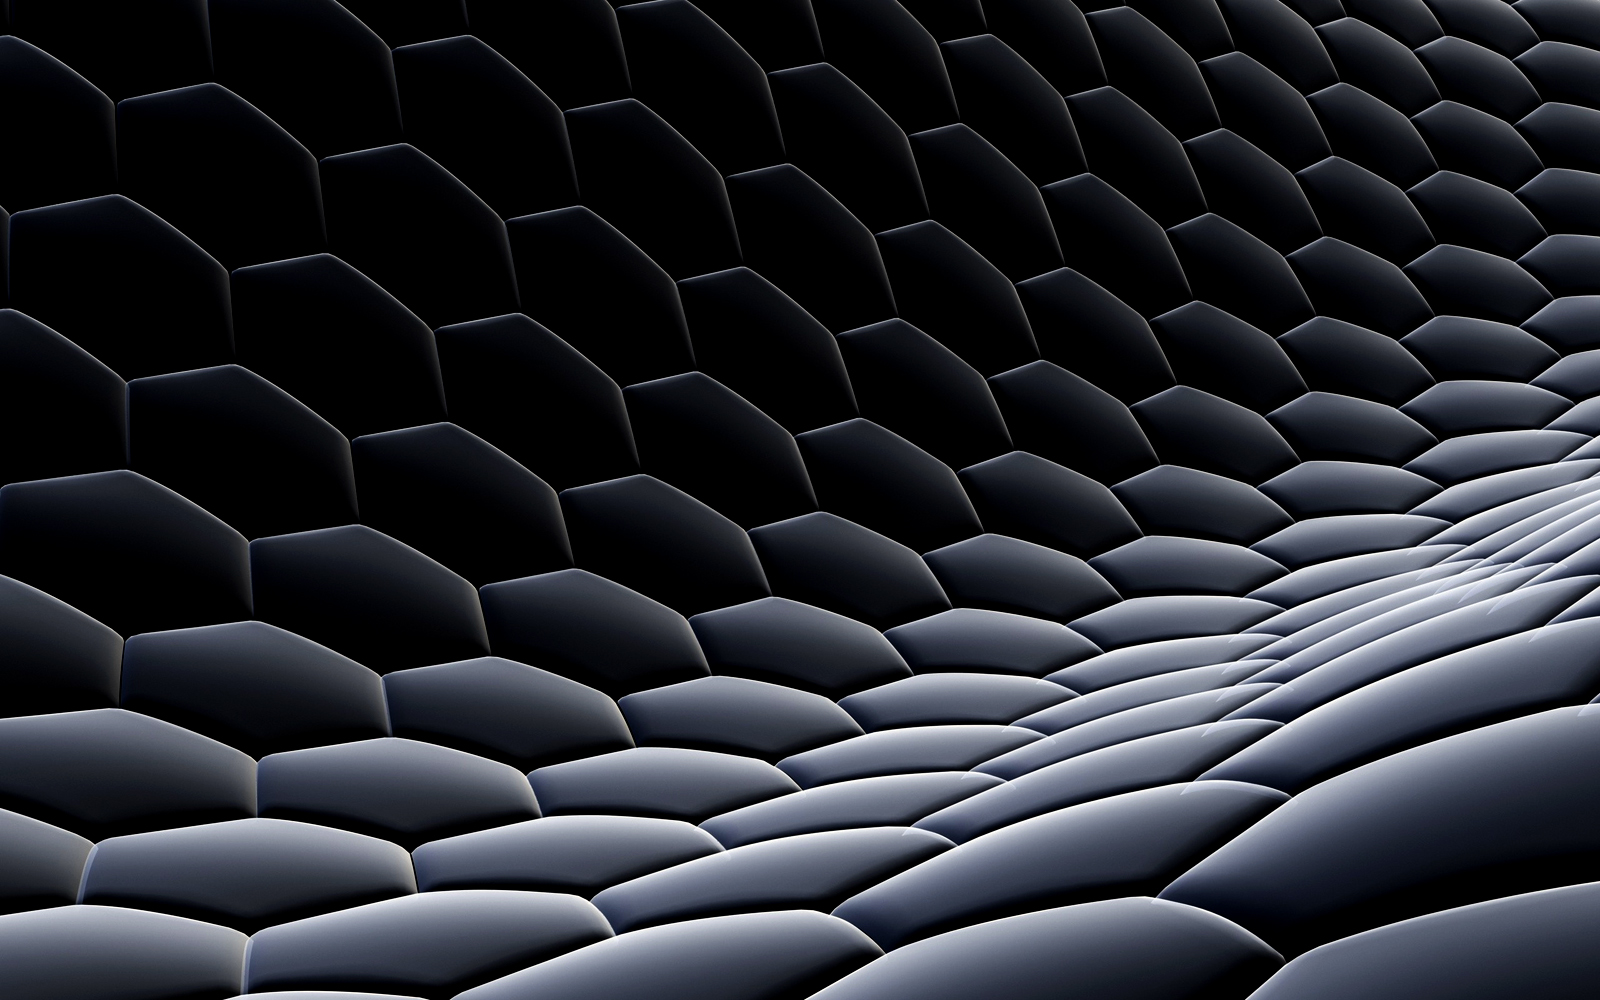 Fiber Texture Carbon Cycle Worksheet